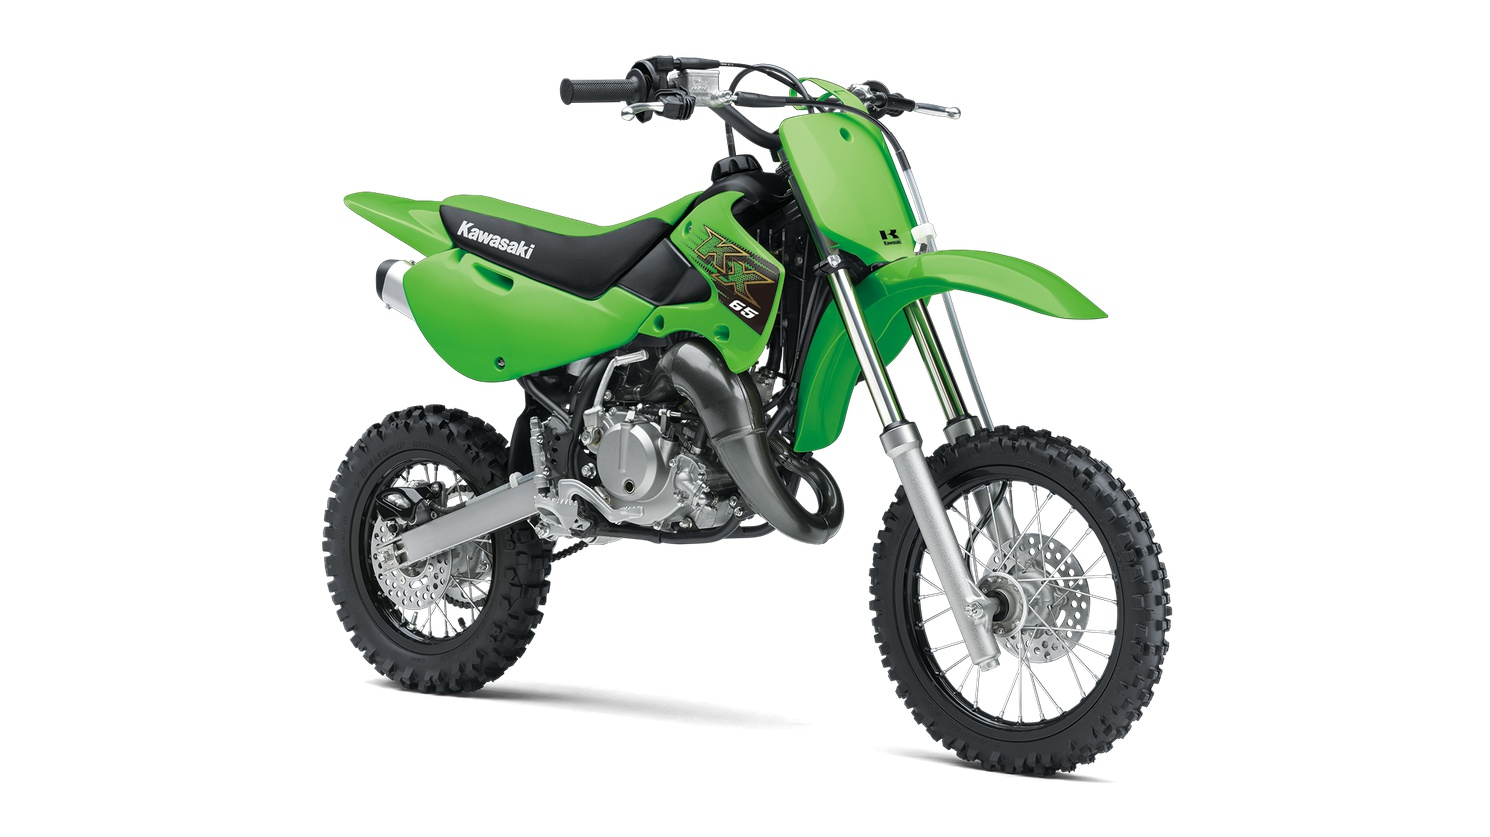 2020 Kawasaki KX65 Lime Green